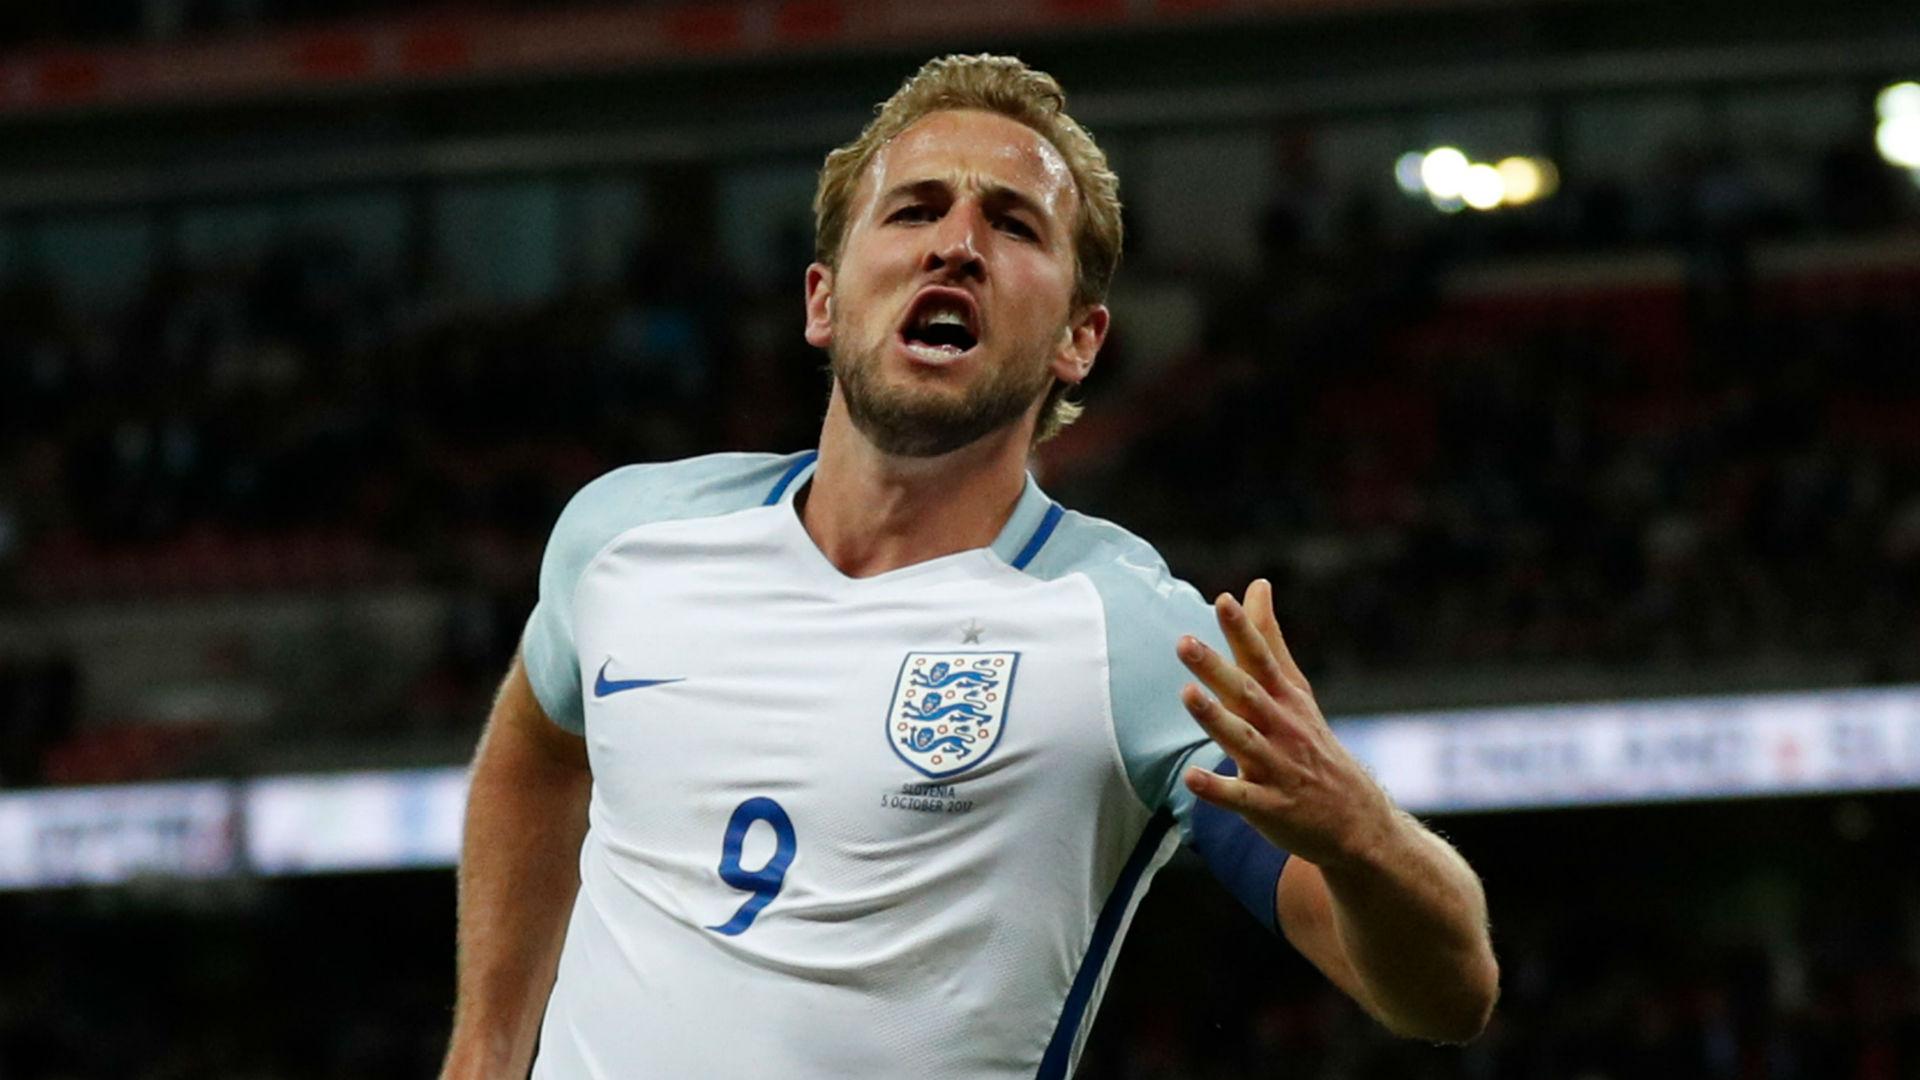 Image result for เคนลั่นอังกฤษจะมาพร้อมความกล้าและดุดัน